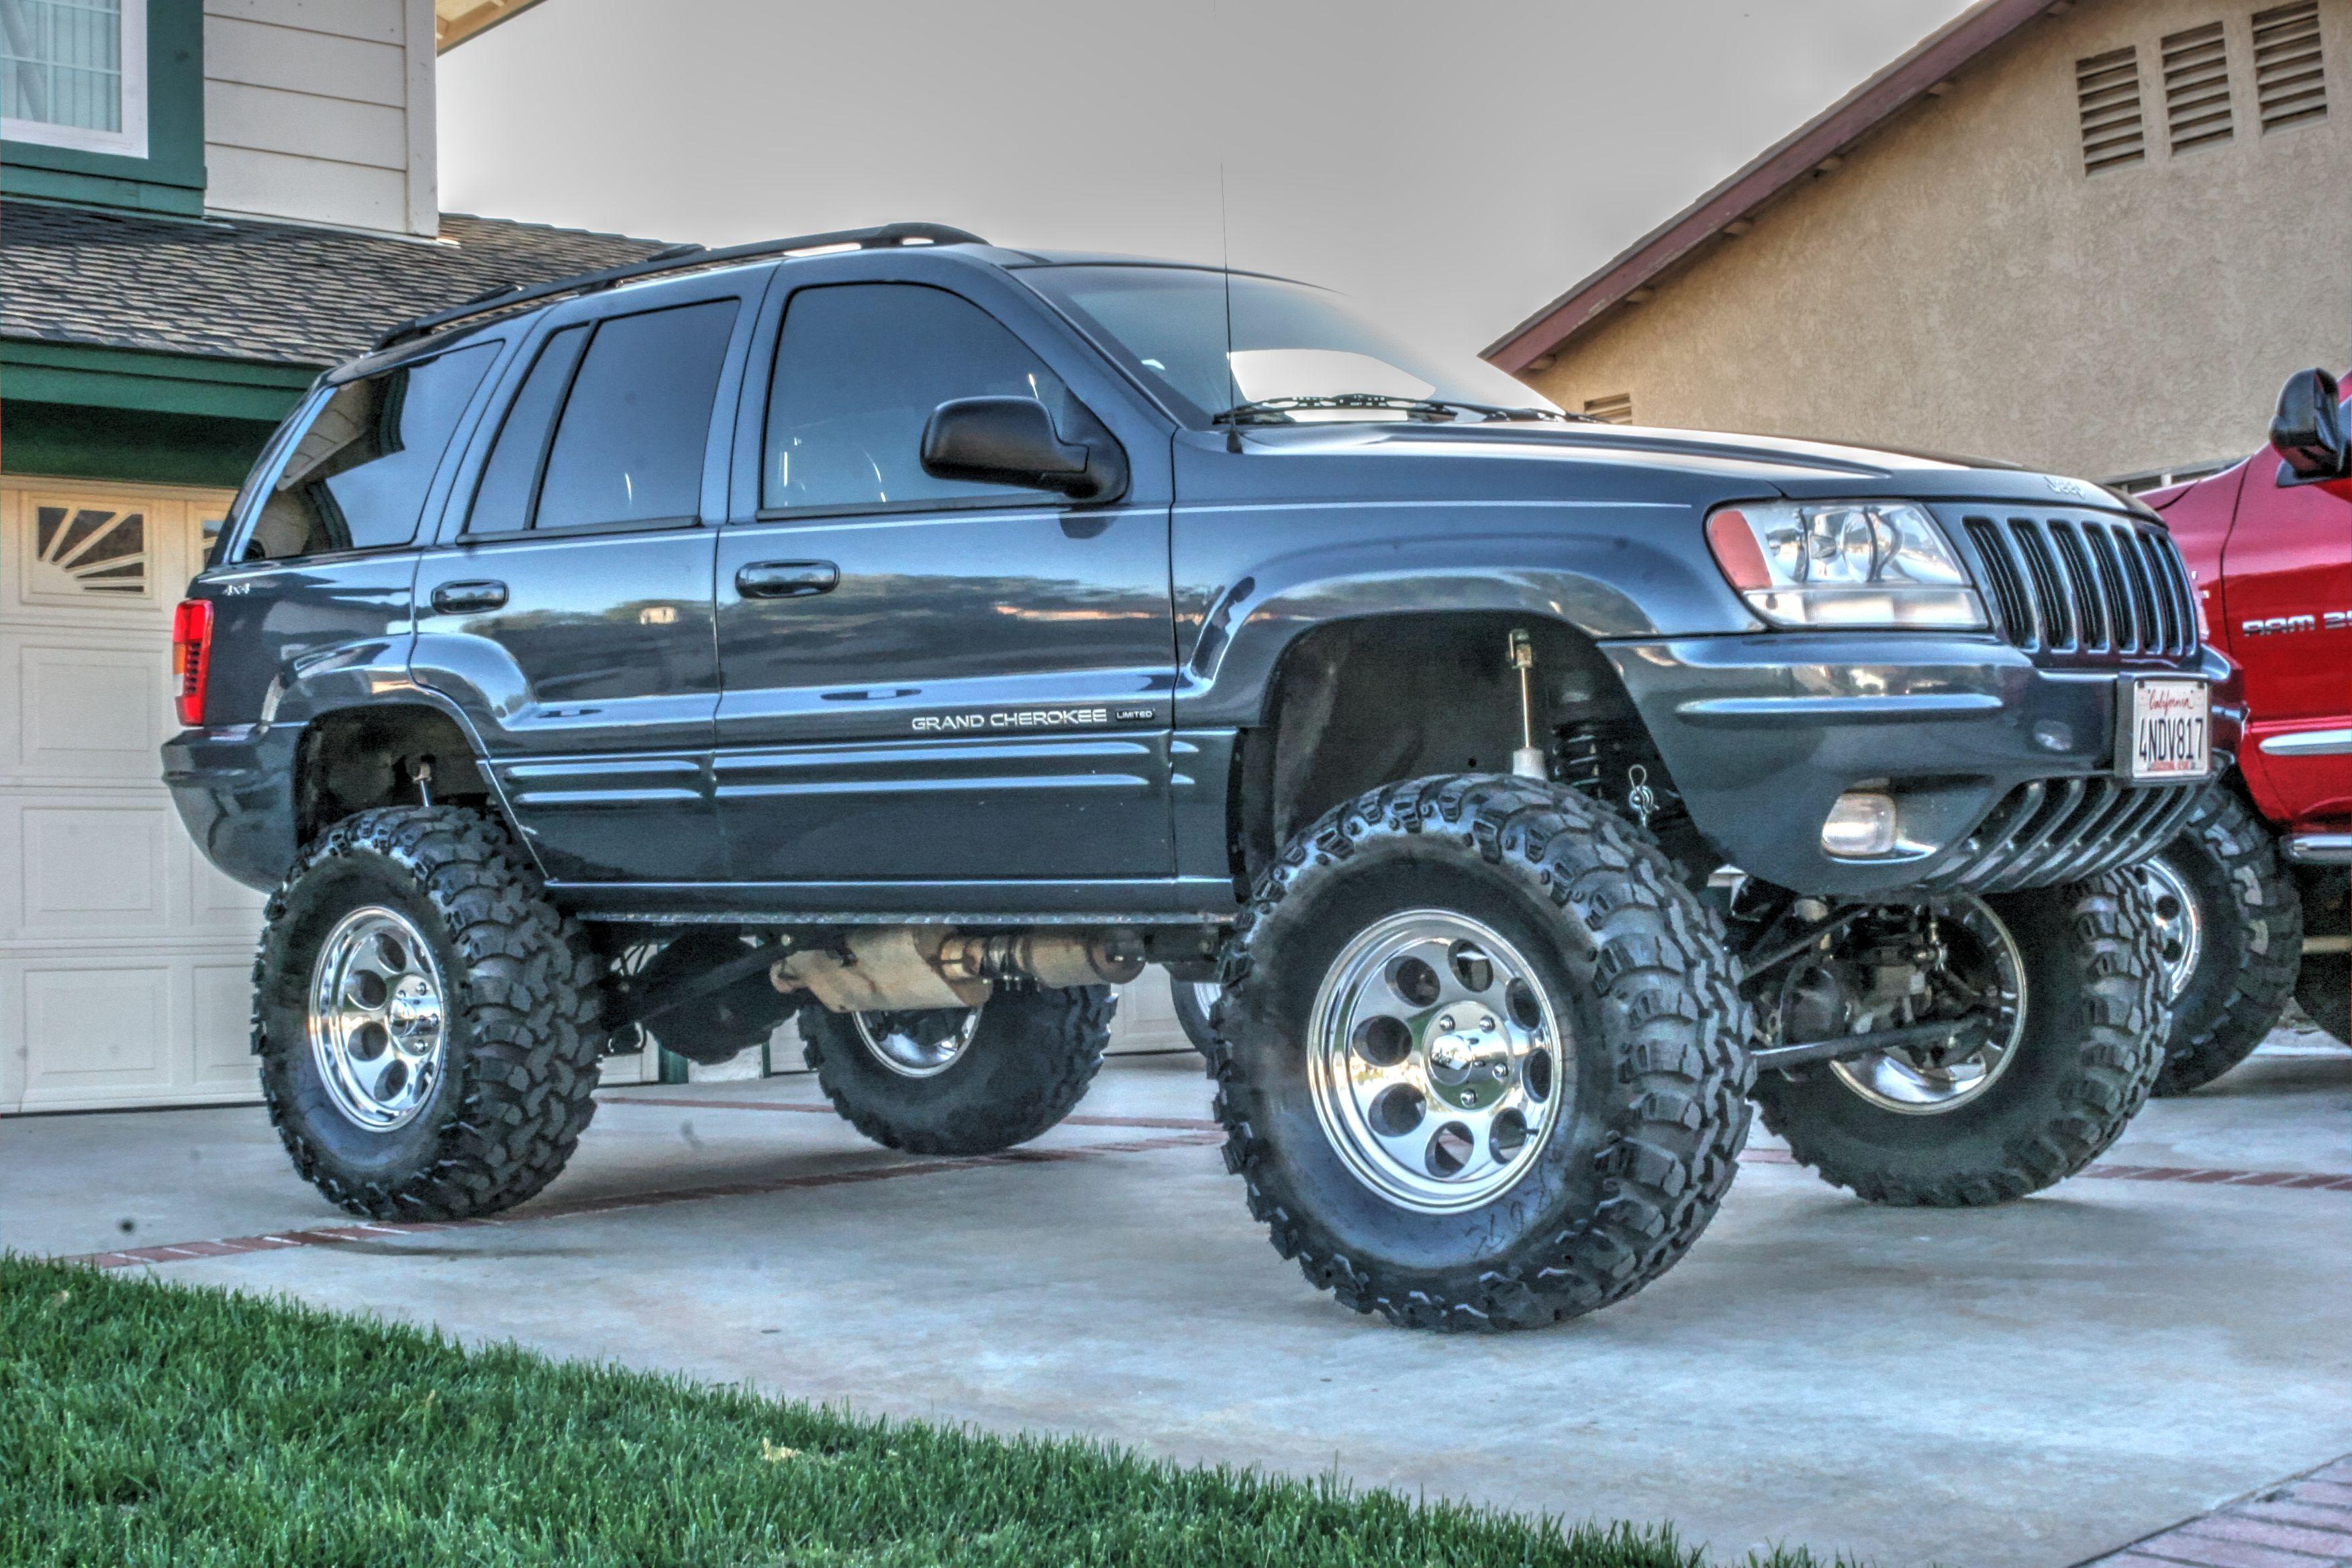 2000 Jeep Grand Cherokee Wj Rockkrawler 6 5 Lift 2 Front